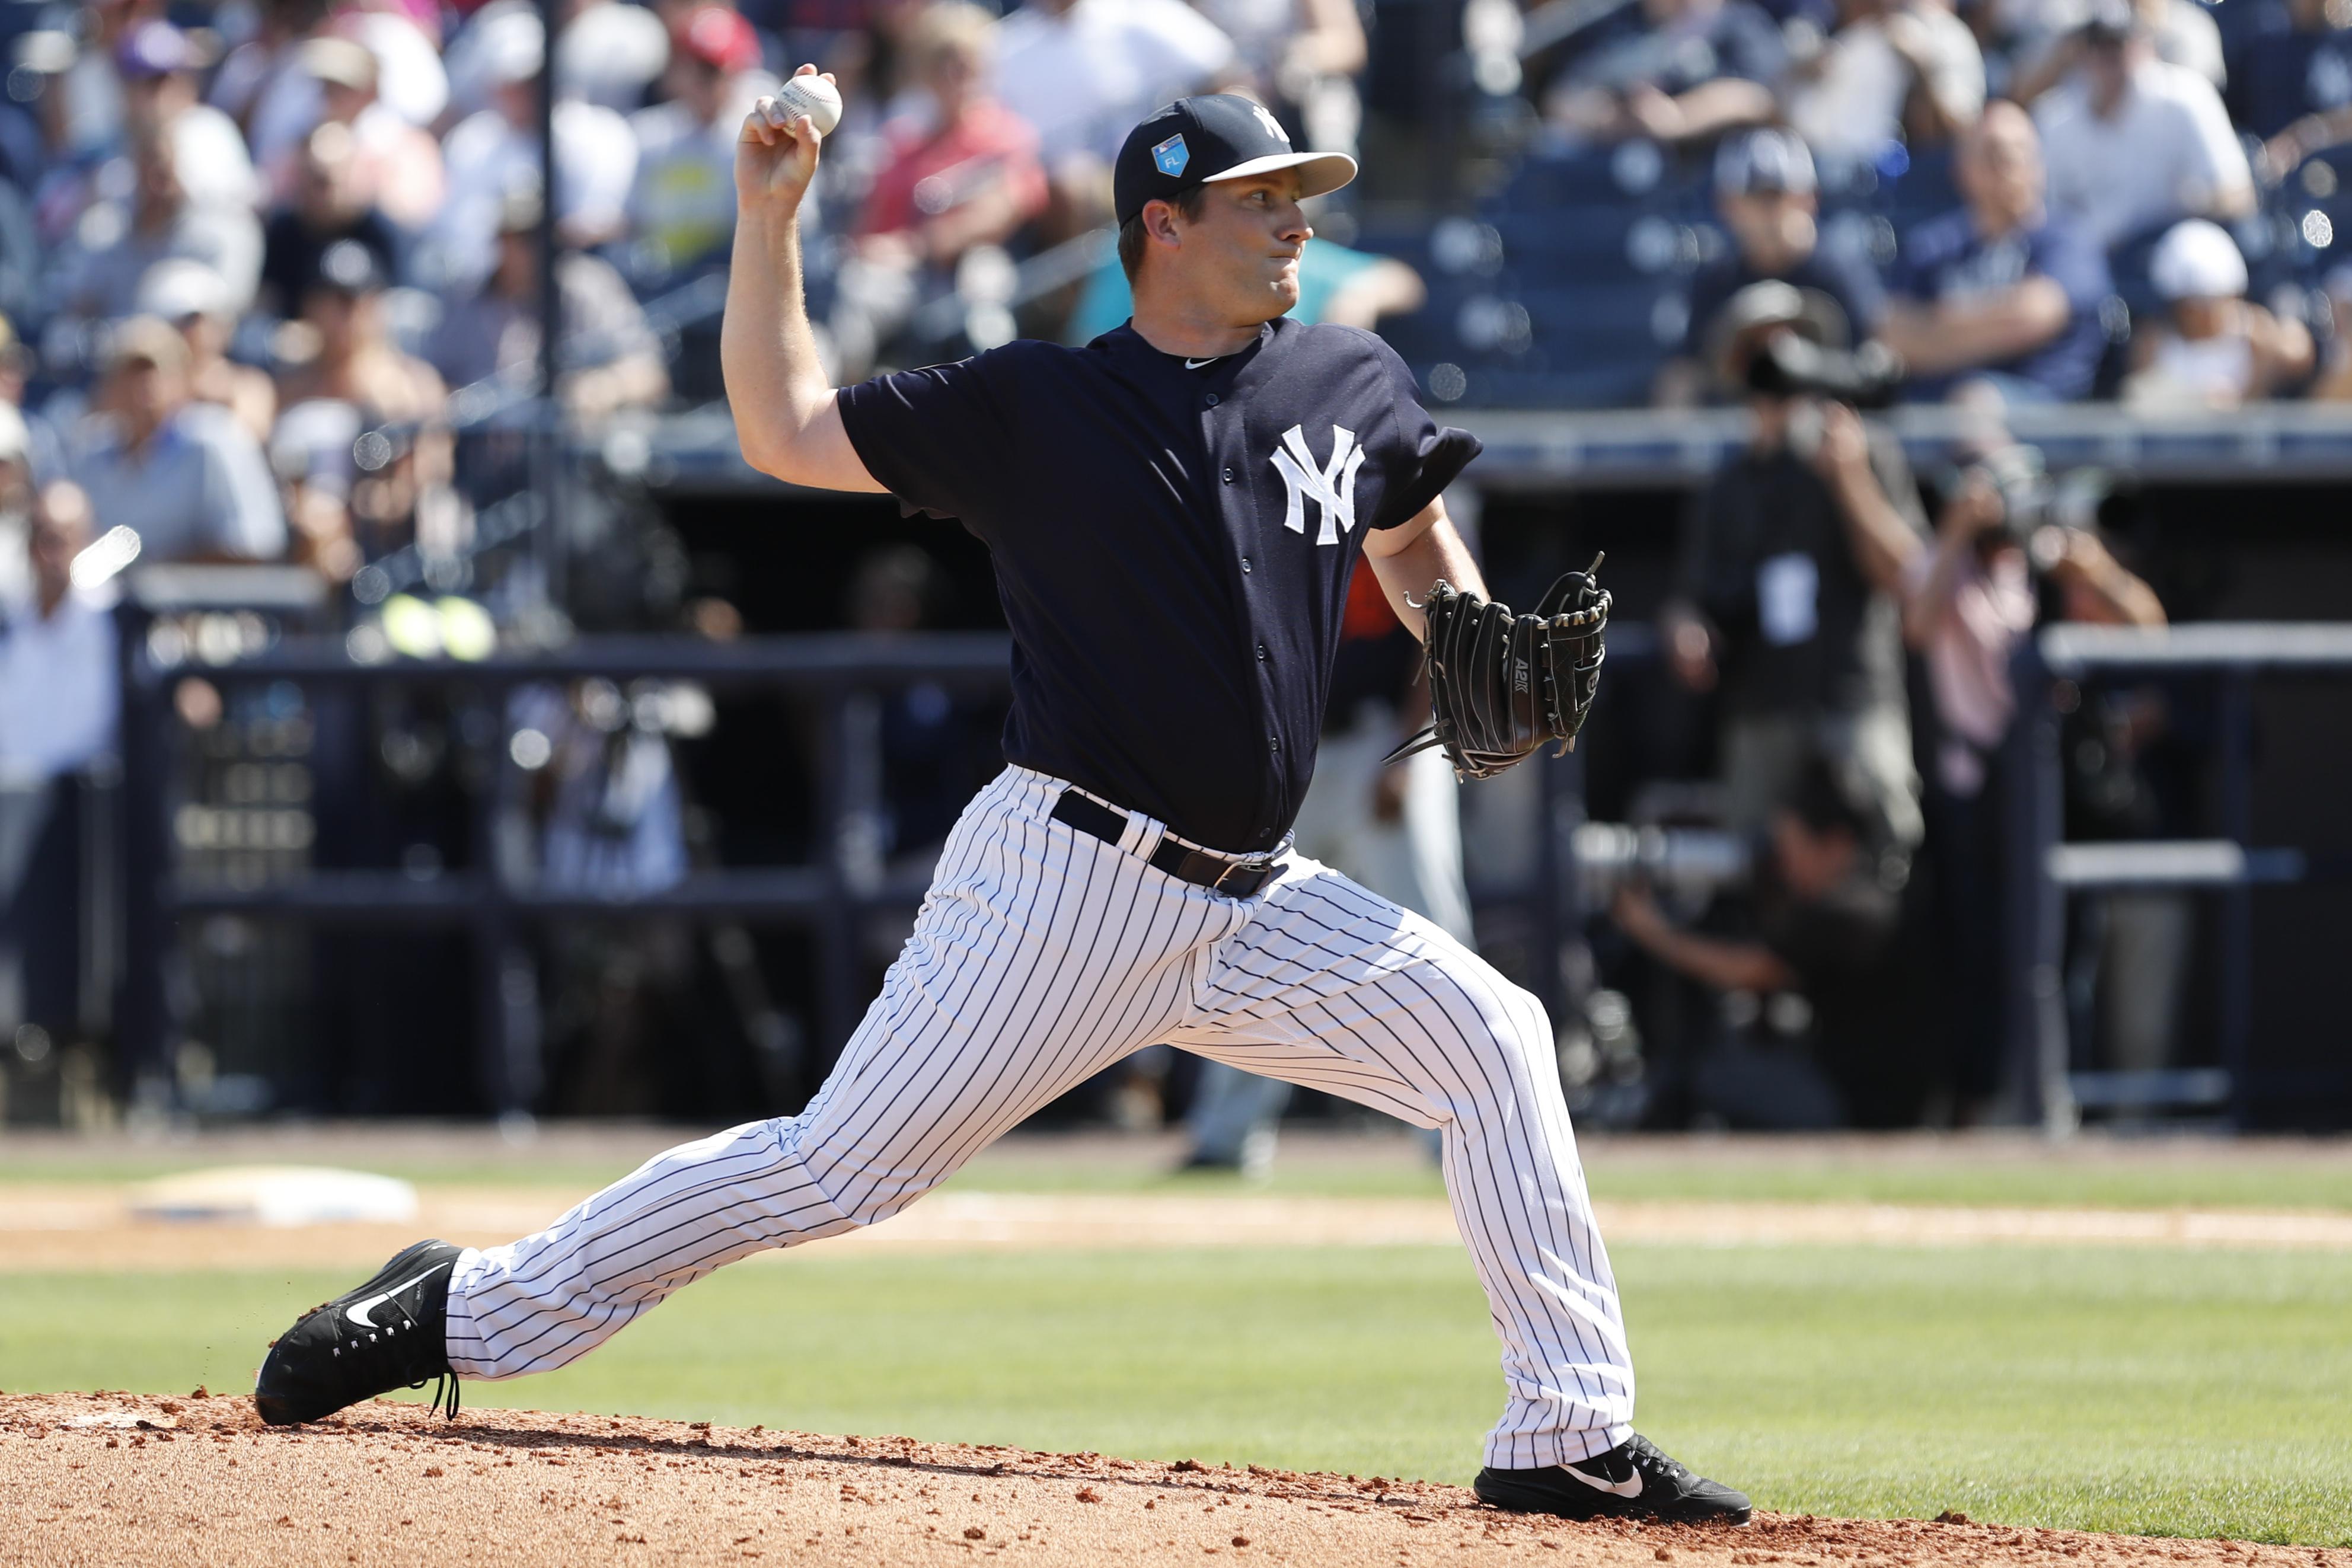 MLB: FEB 28 Spring Training - Tigers at Yankees